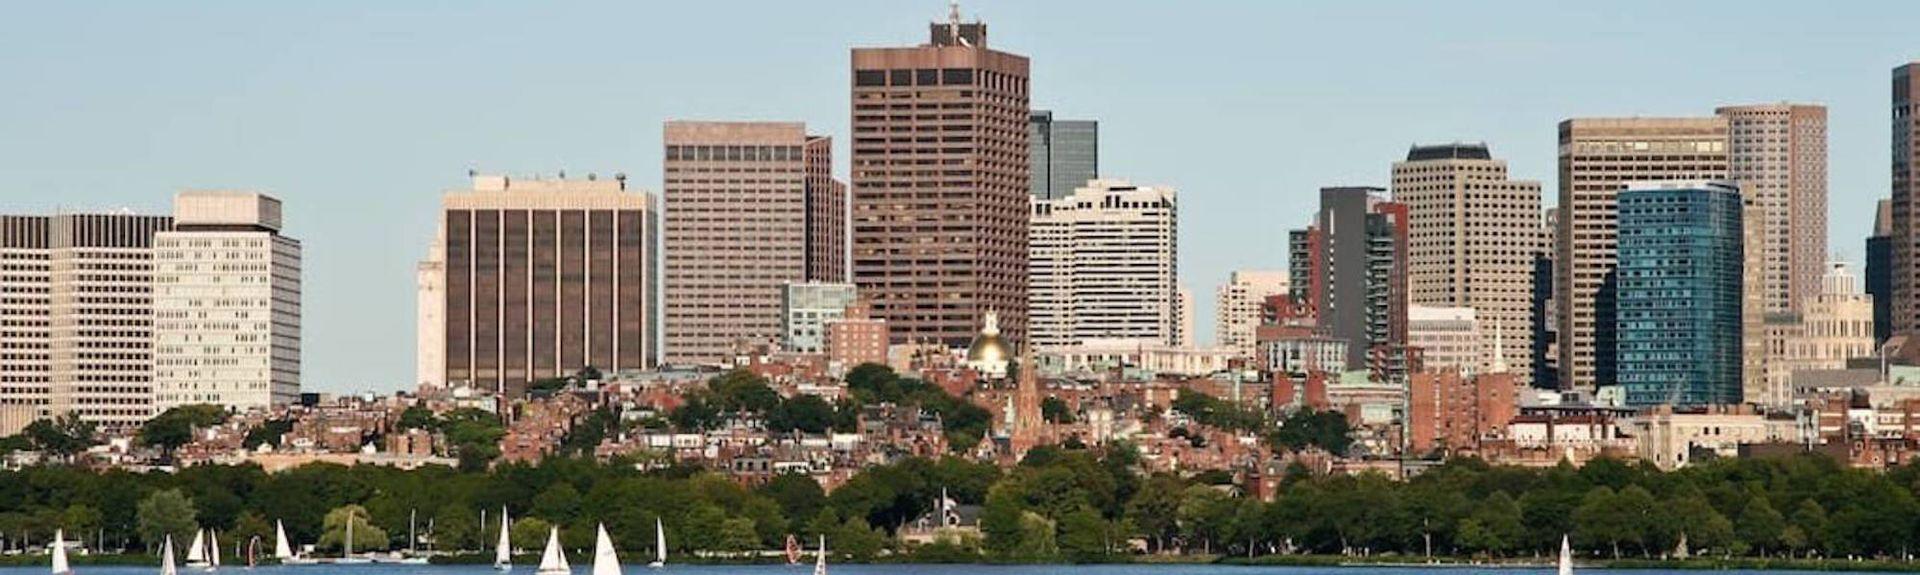 Boston Financial District, Boston, Massachusetts, United States of America